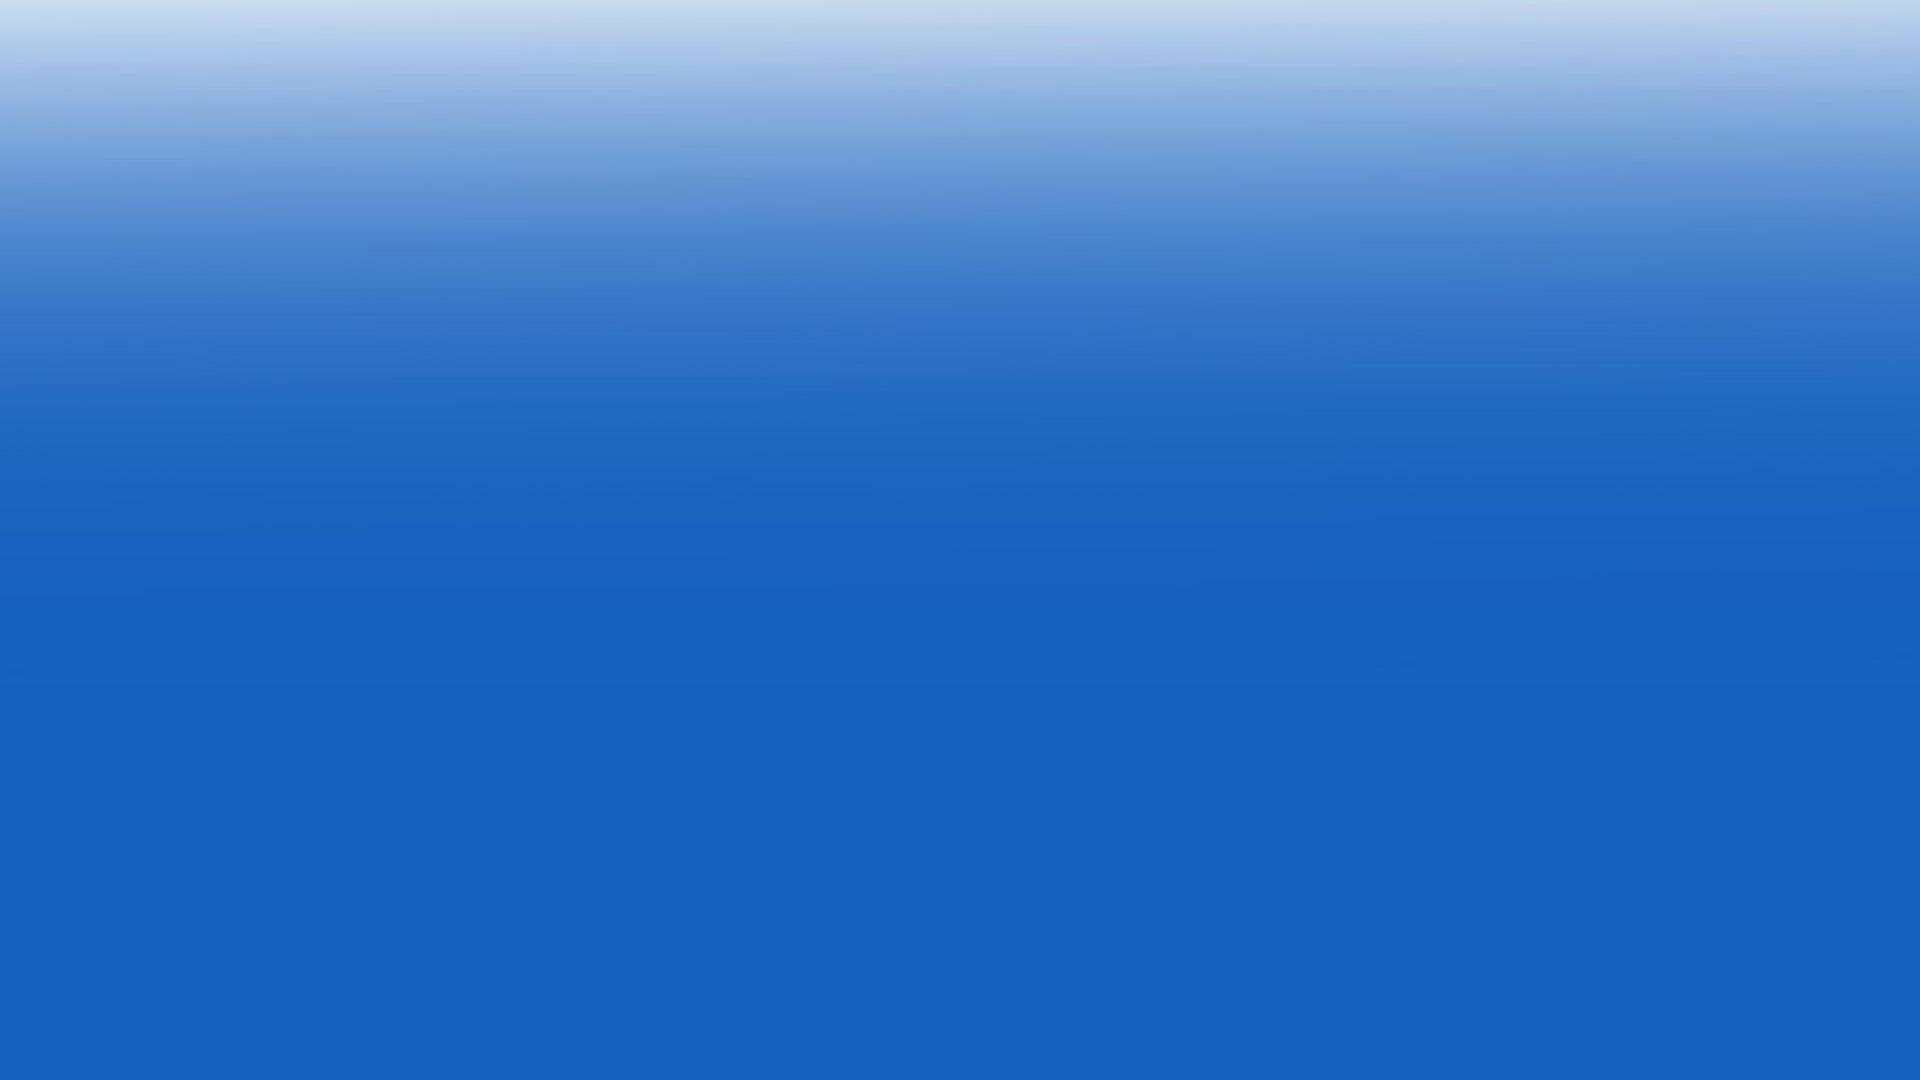 blue-1920x1080-Denim-Blue-to-White-Desktop-Blue-wallpaper-wpc9003010